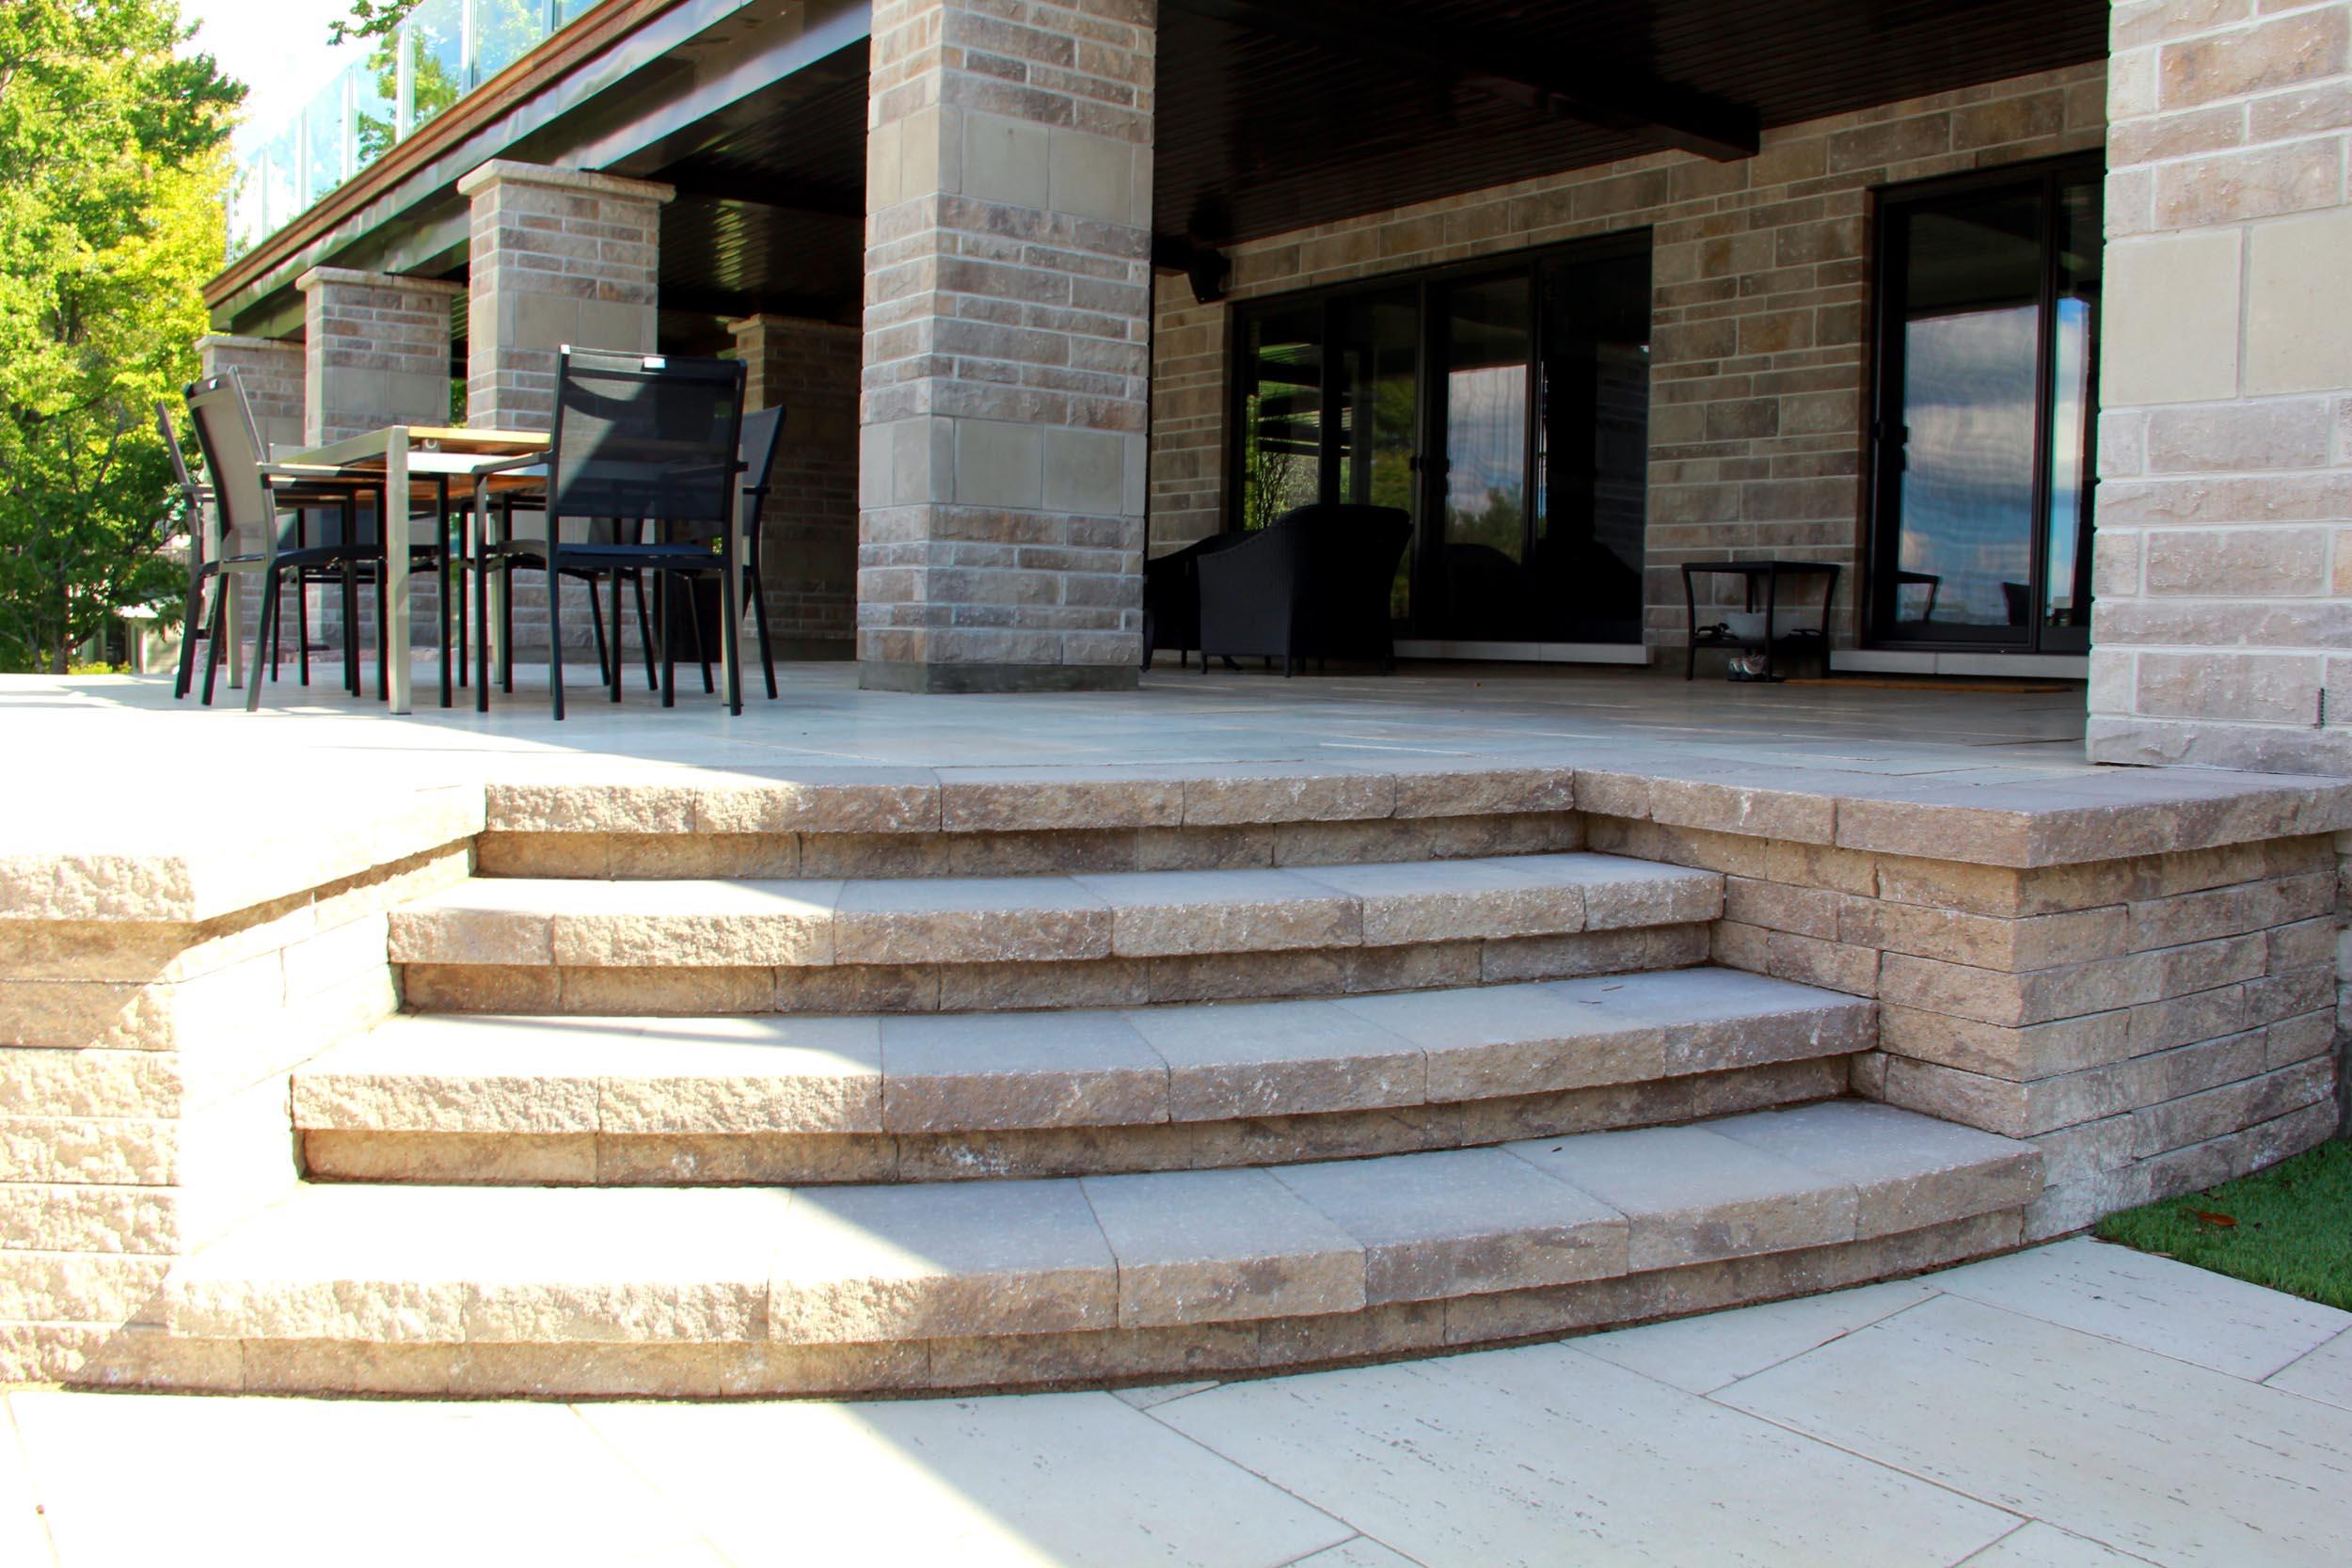 Riverview Design Solutions - Thousand Islands Waterfront Home - Patio Space - Landscape Architecture.jpg